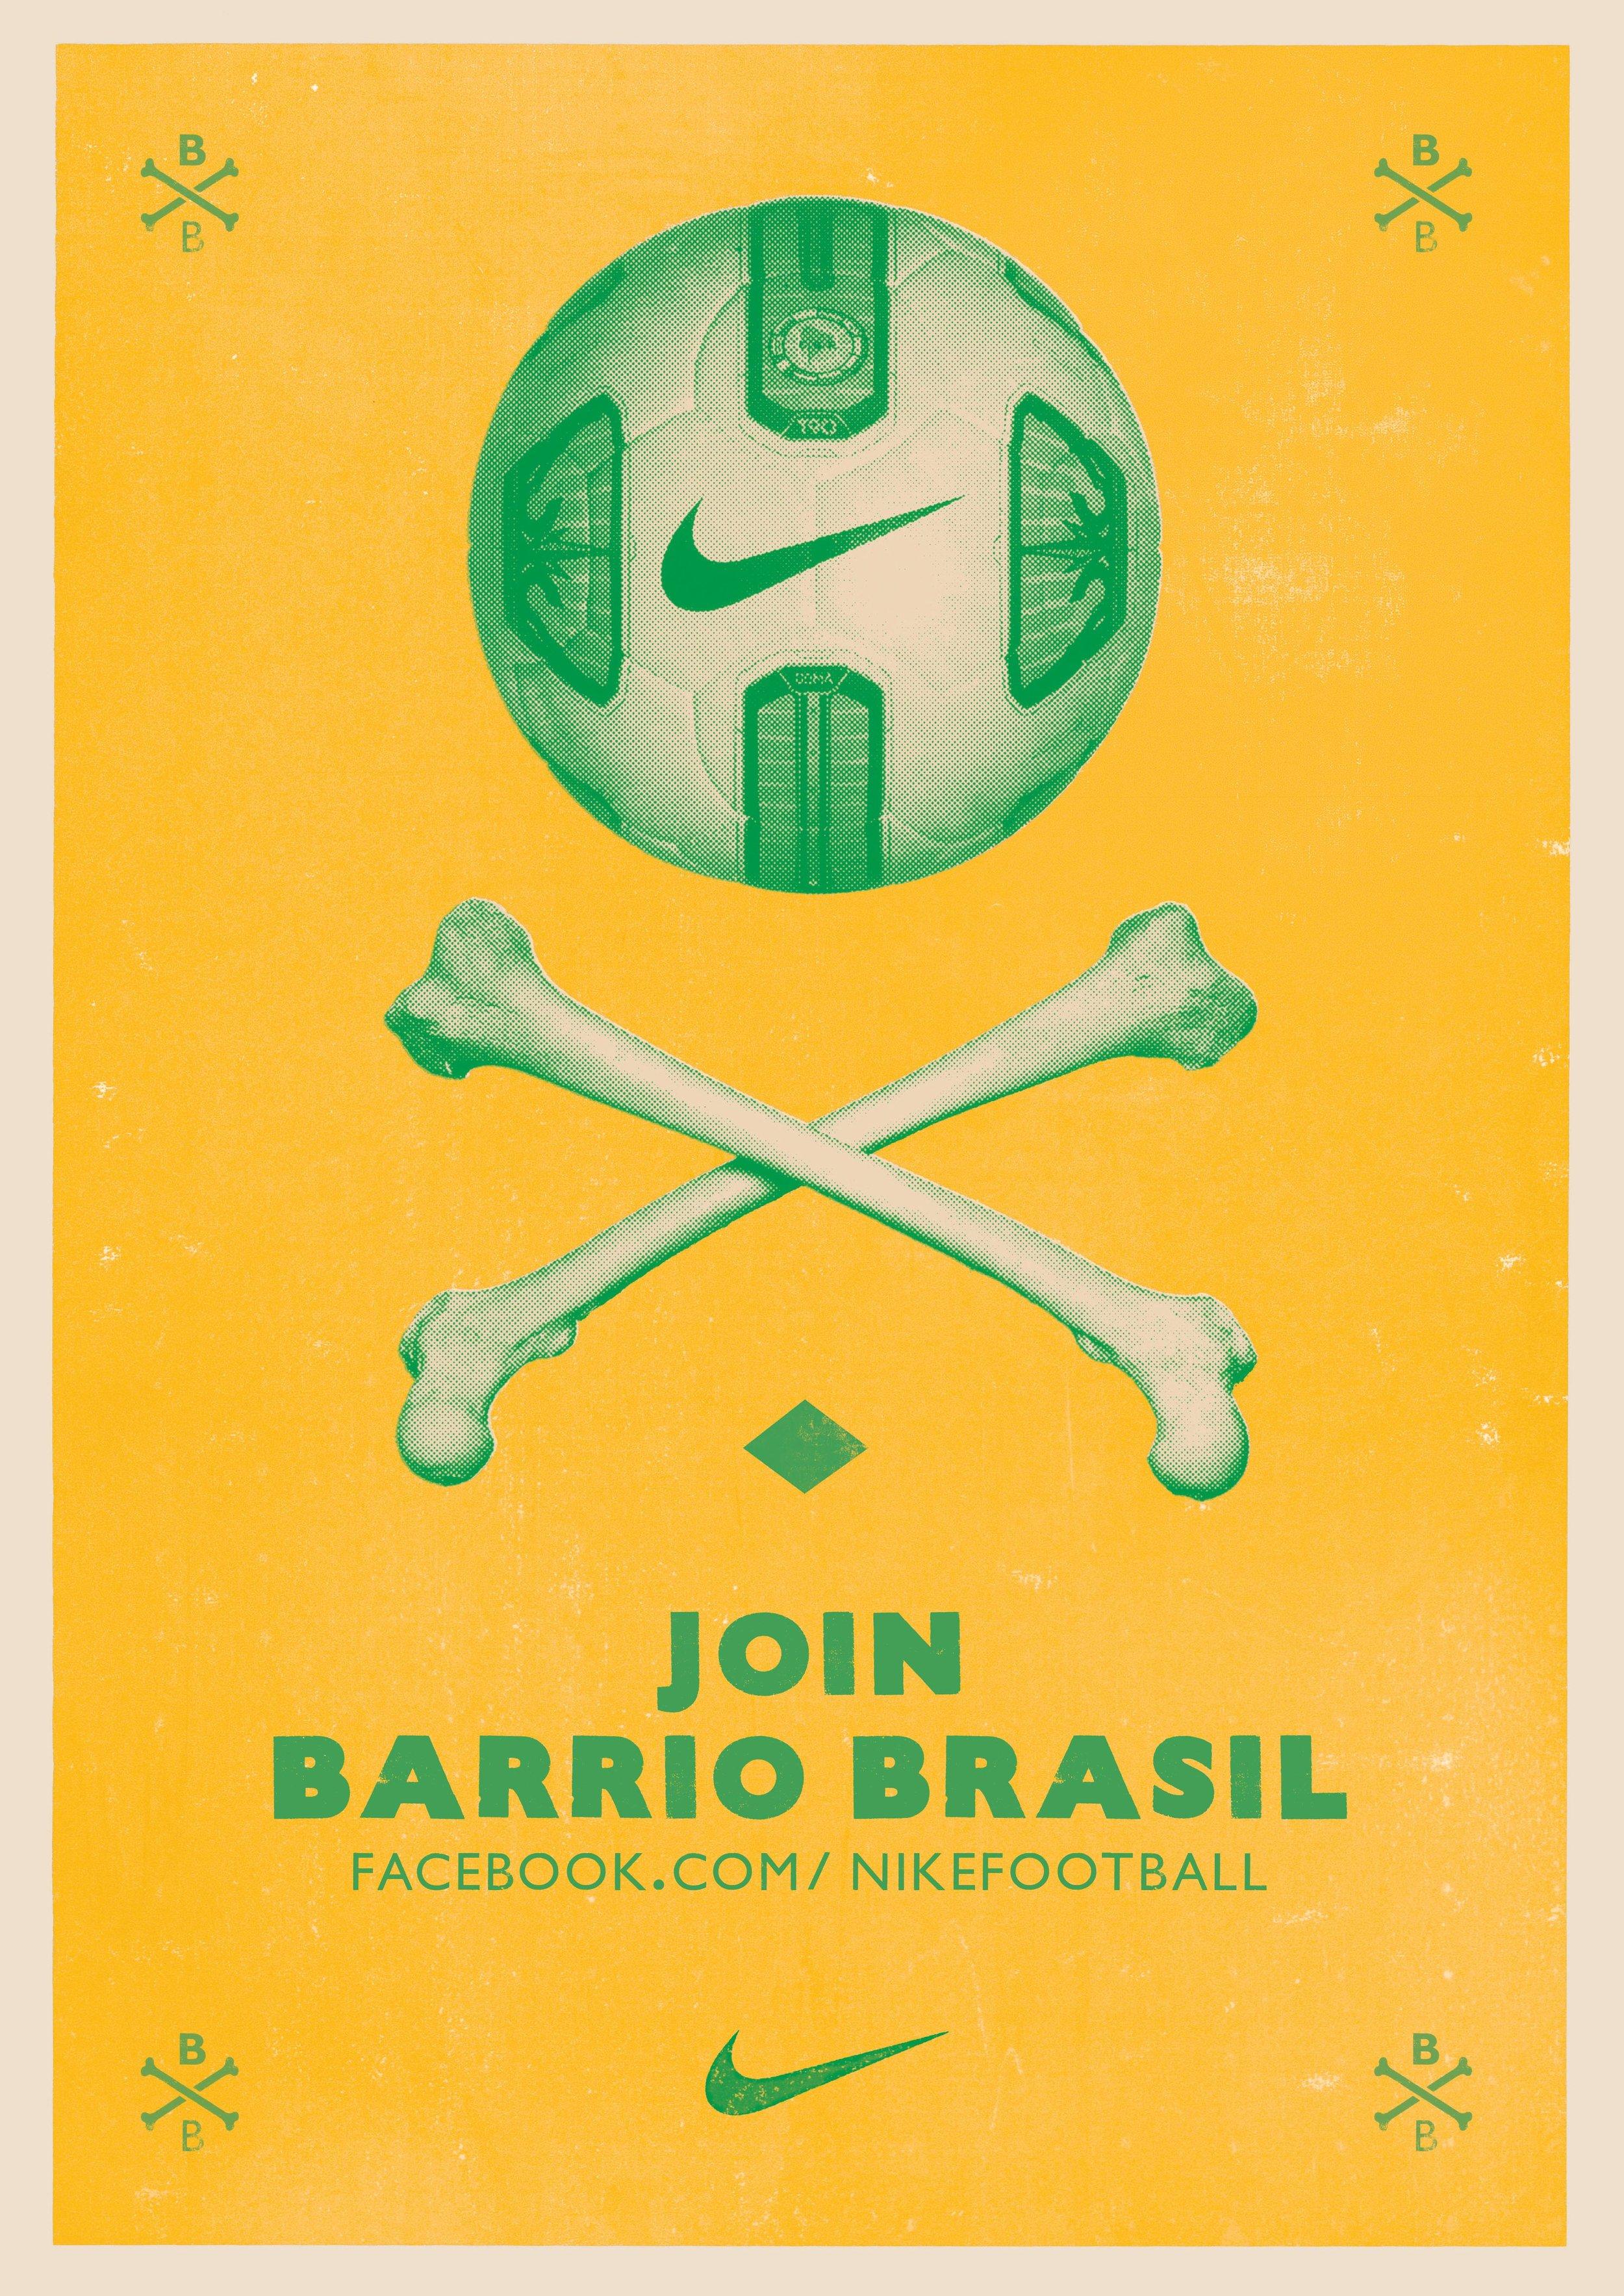 Copa_Join_Barrio_A3_Brasil.jpg